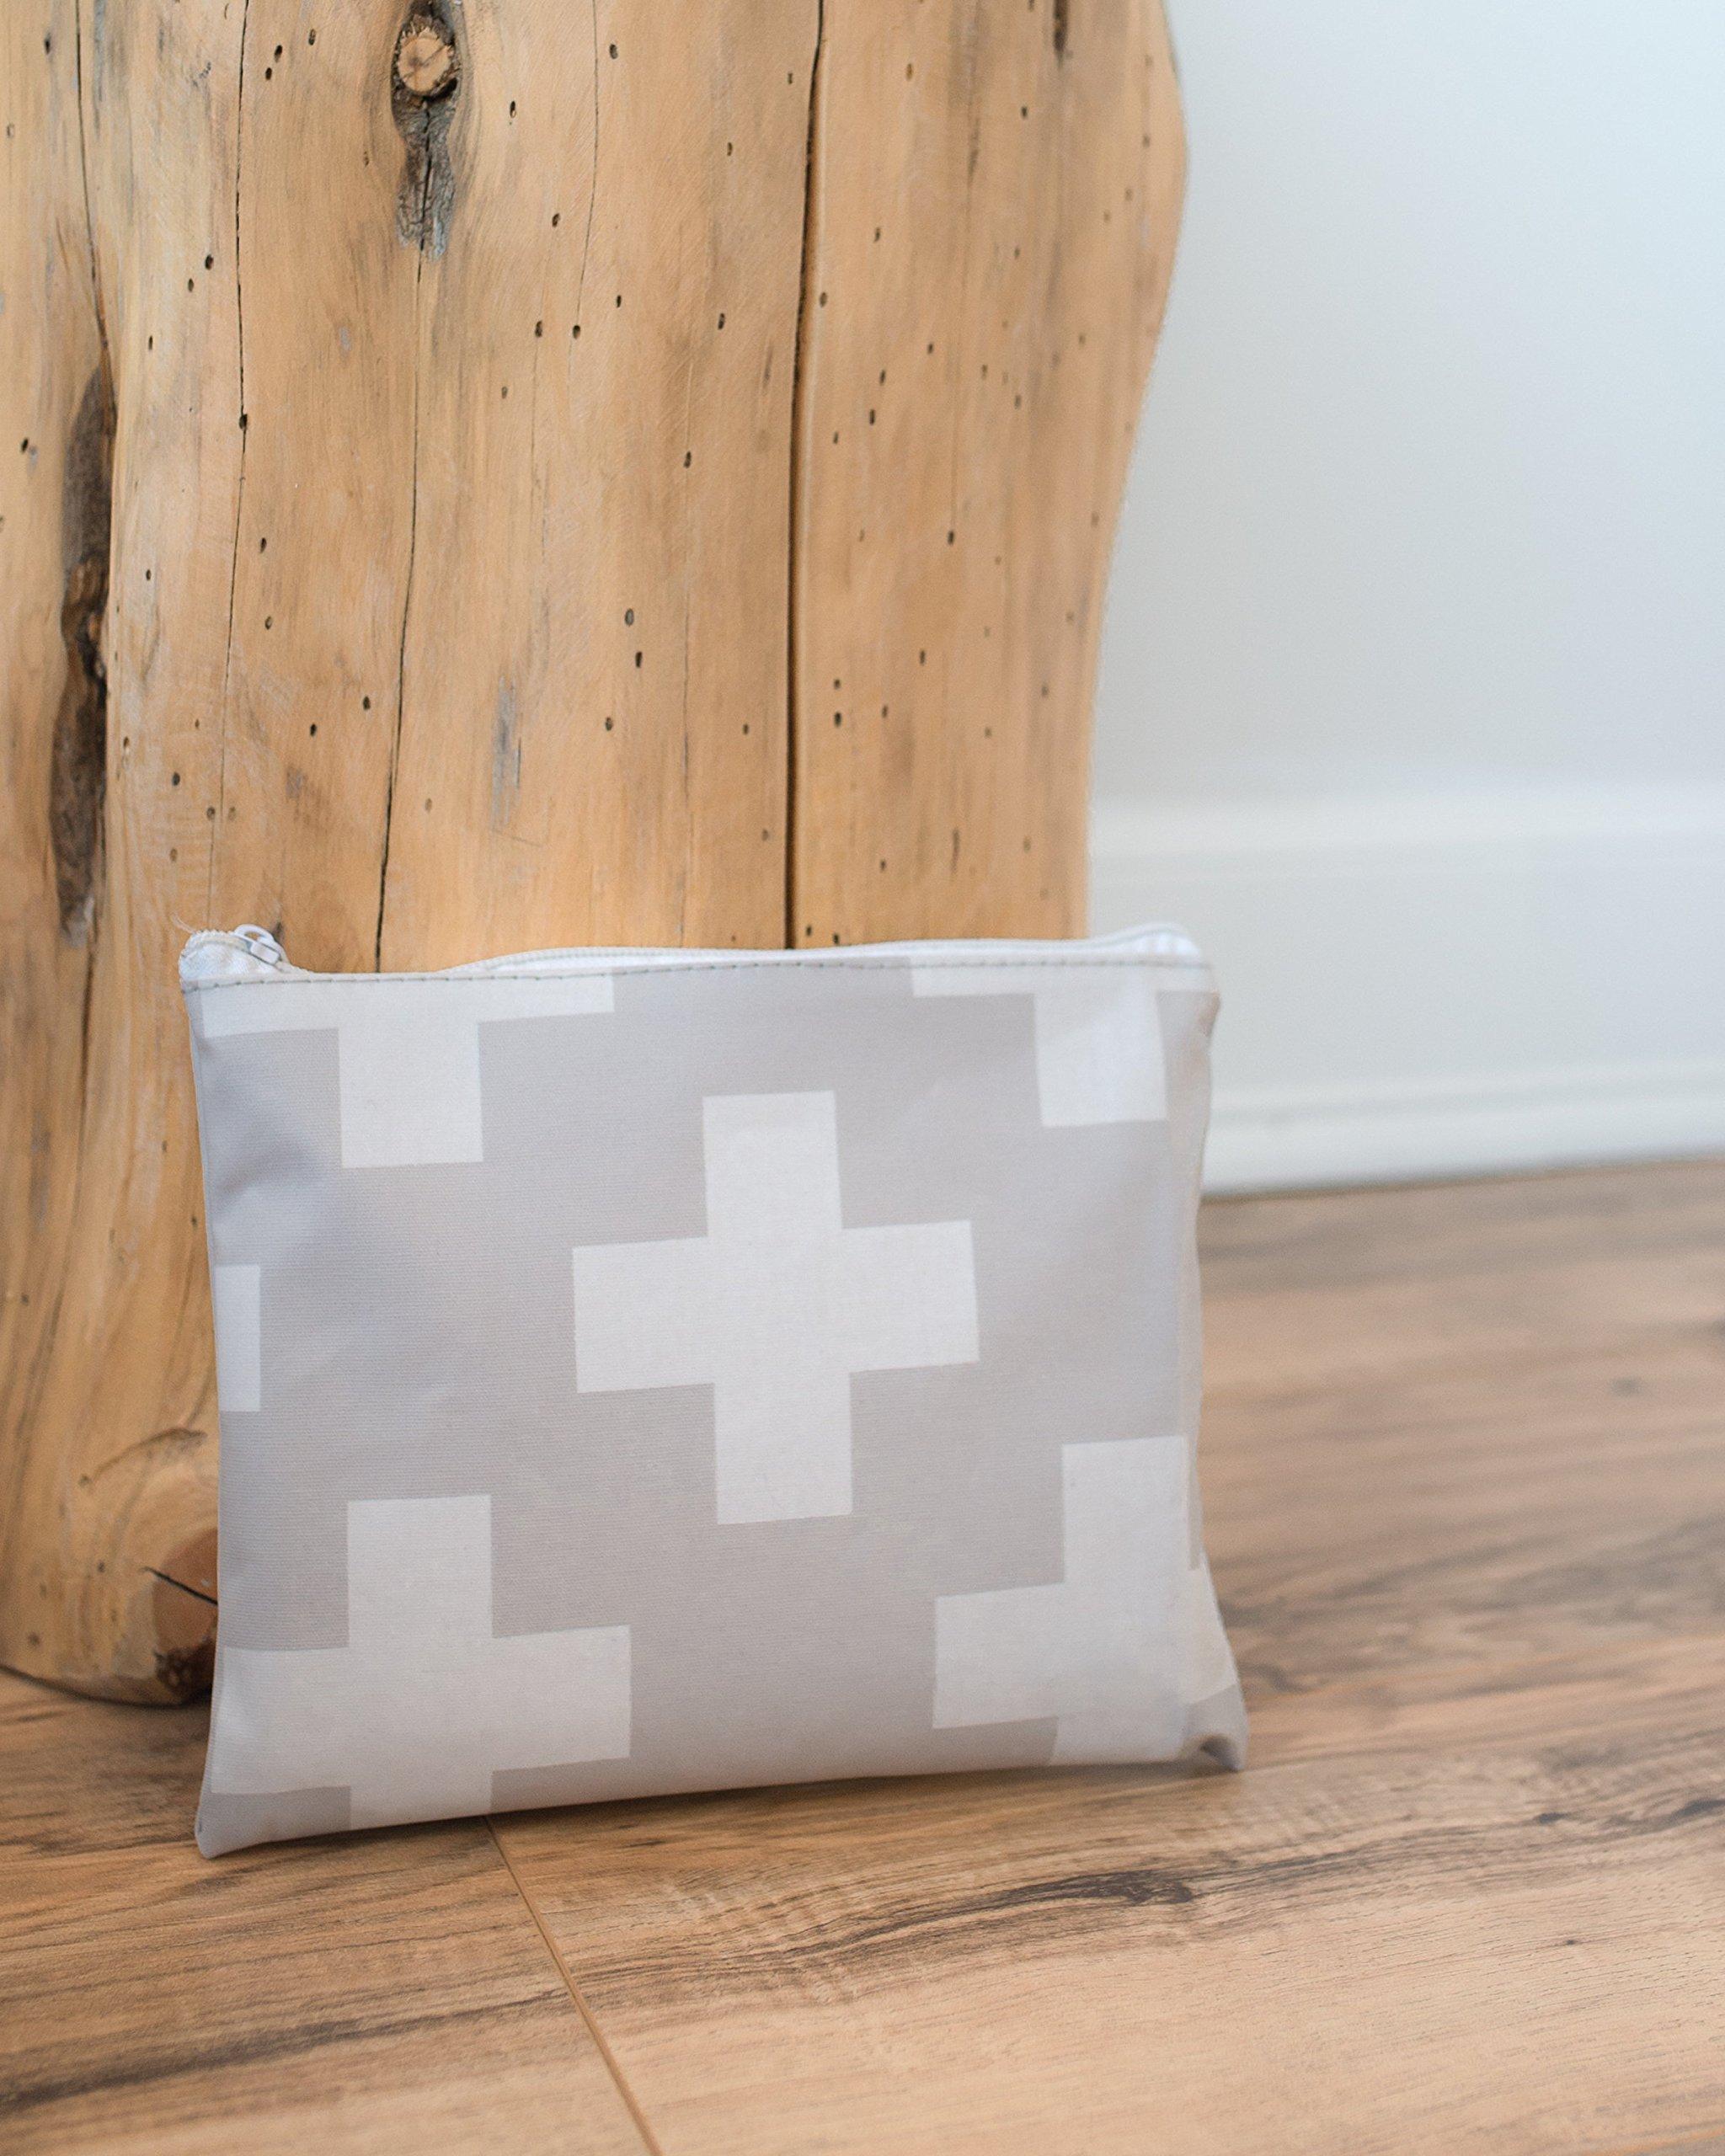 splat mat by honeyed crosses modern design large nontoxic high